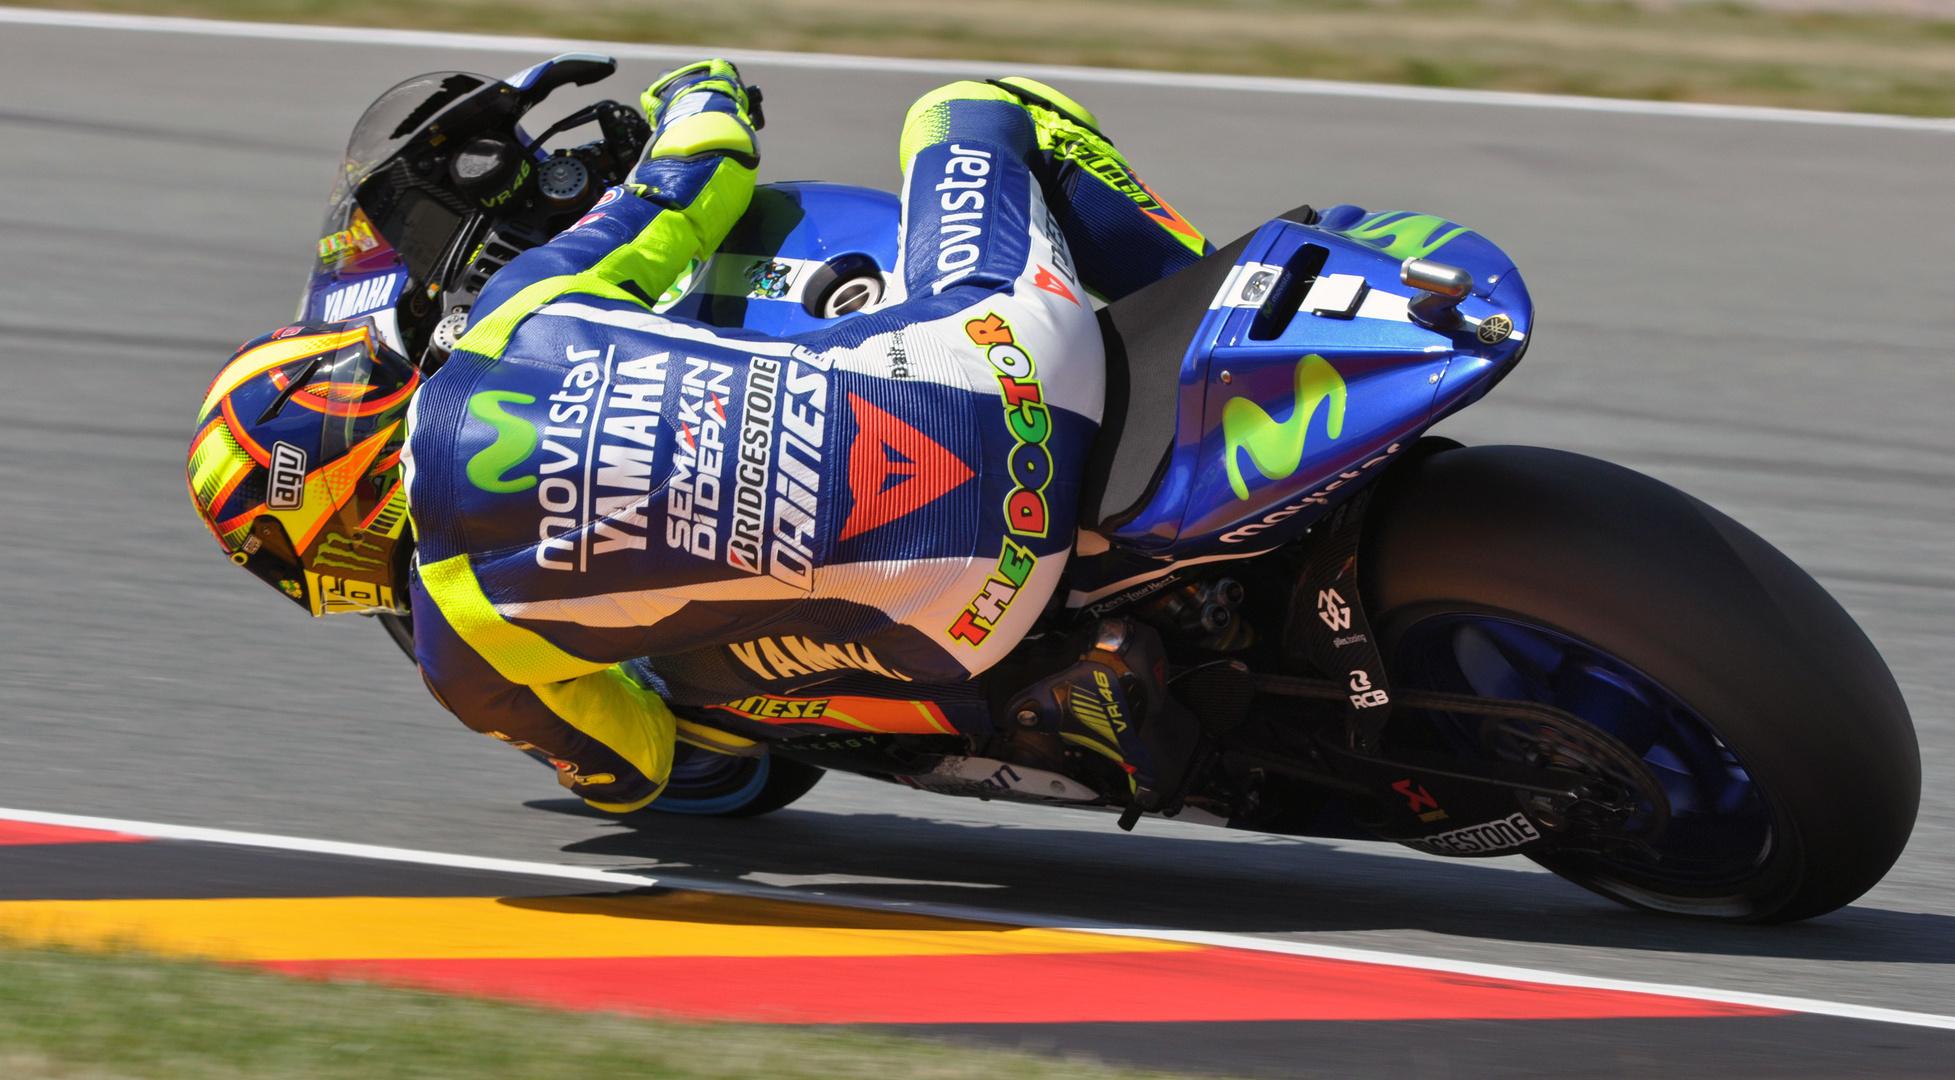 VR46 @ MotoGP Sachsenring 2015